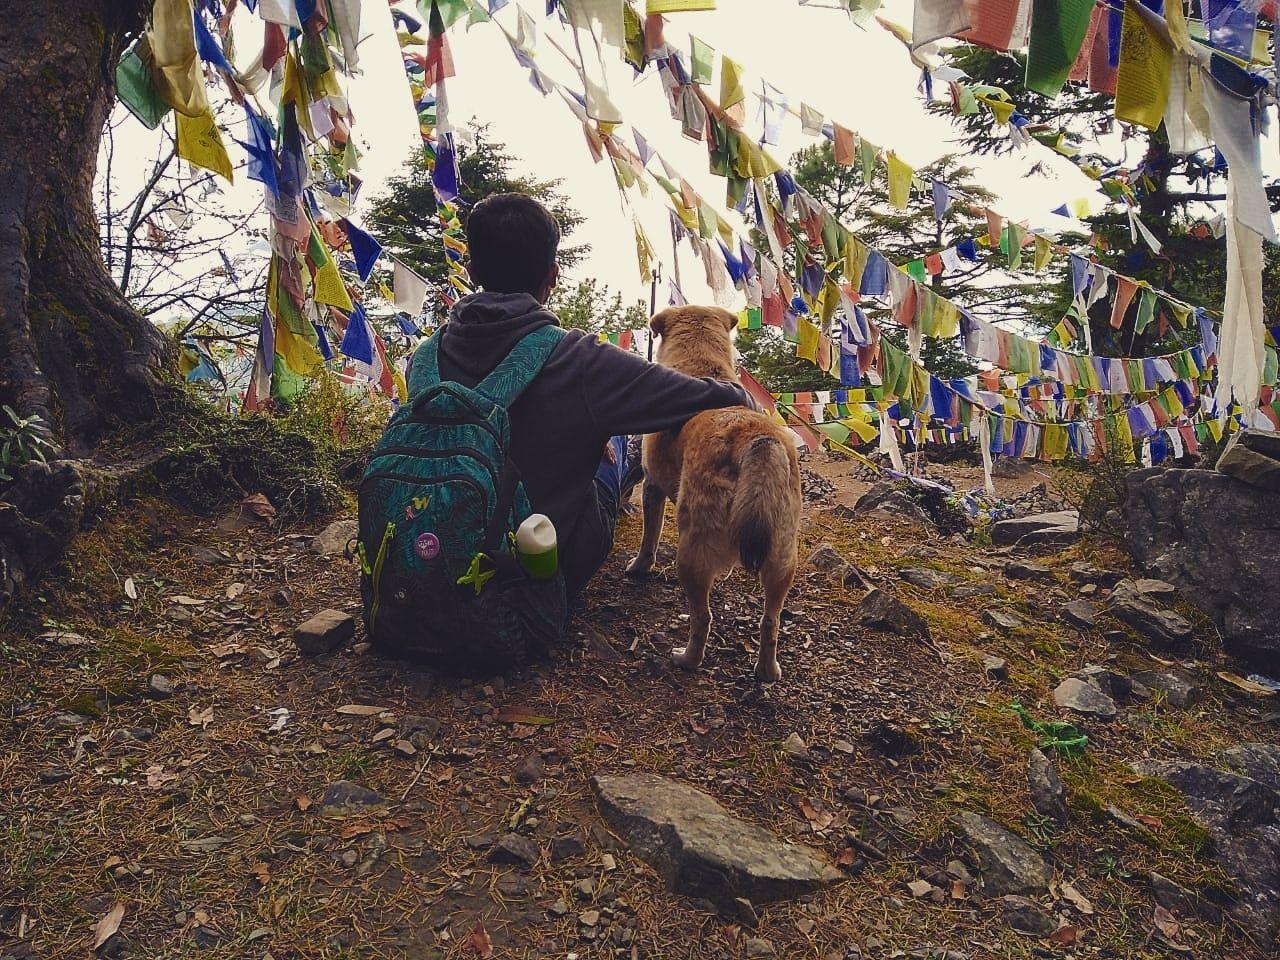 Photo of Tibetan Children's Villages (TCV) By Kshitij Pratap